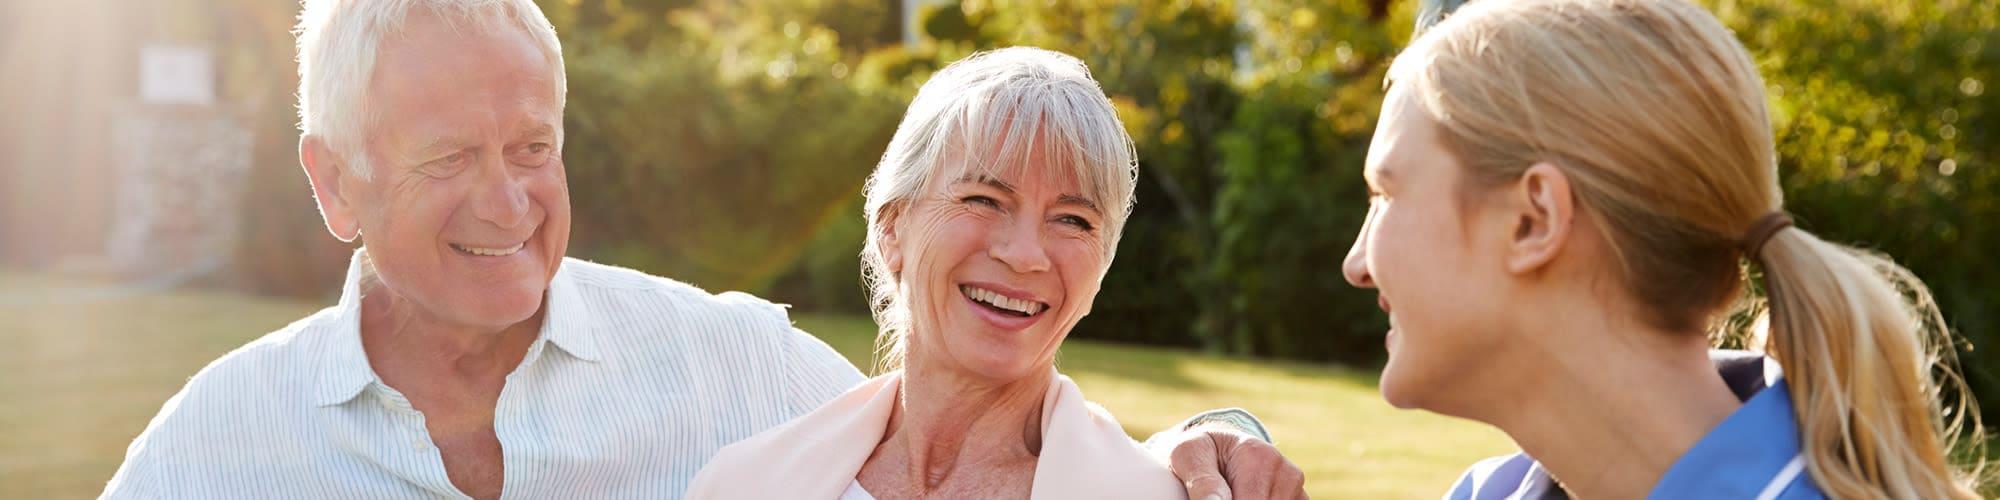 Living care options at Kirkwood Orange in Orange, California